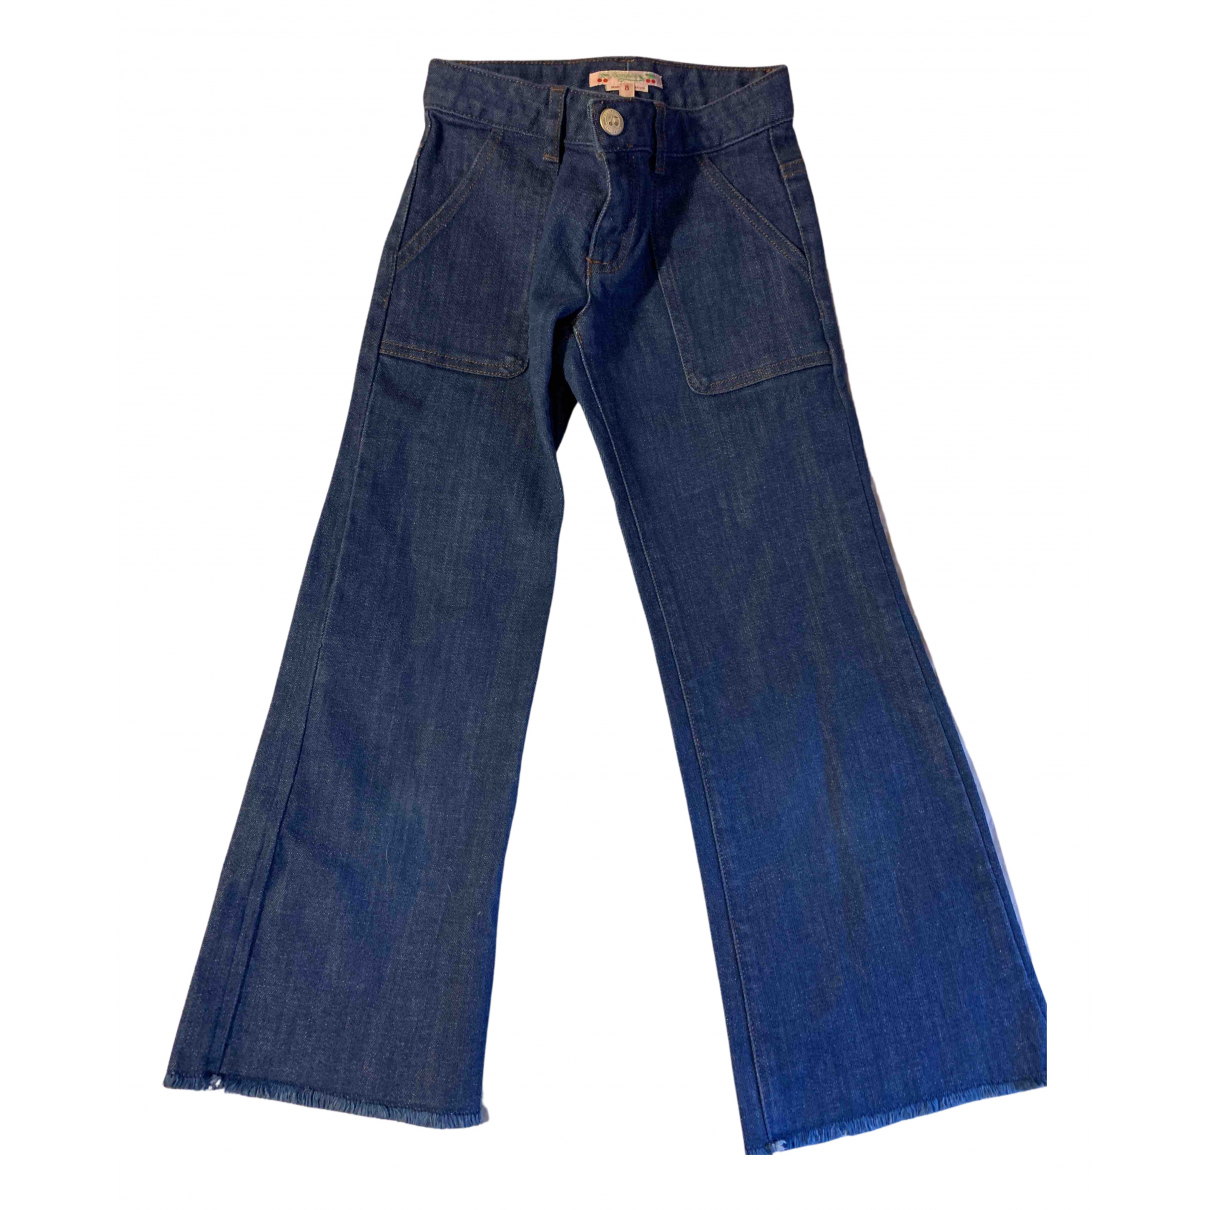 Bonpoint - Pantalon   pour enfant en denim - bleu